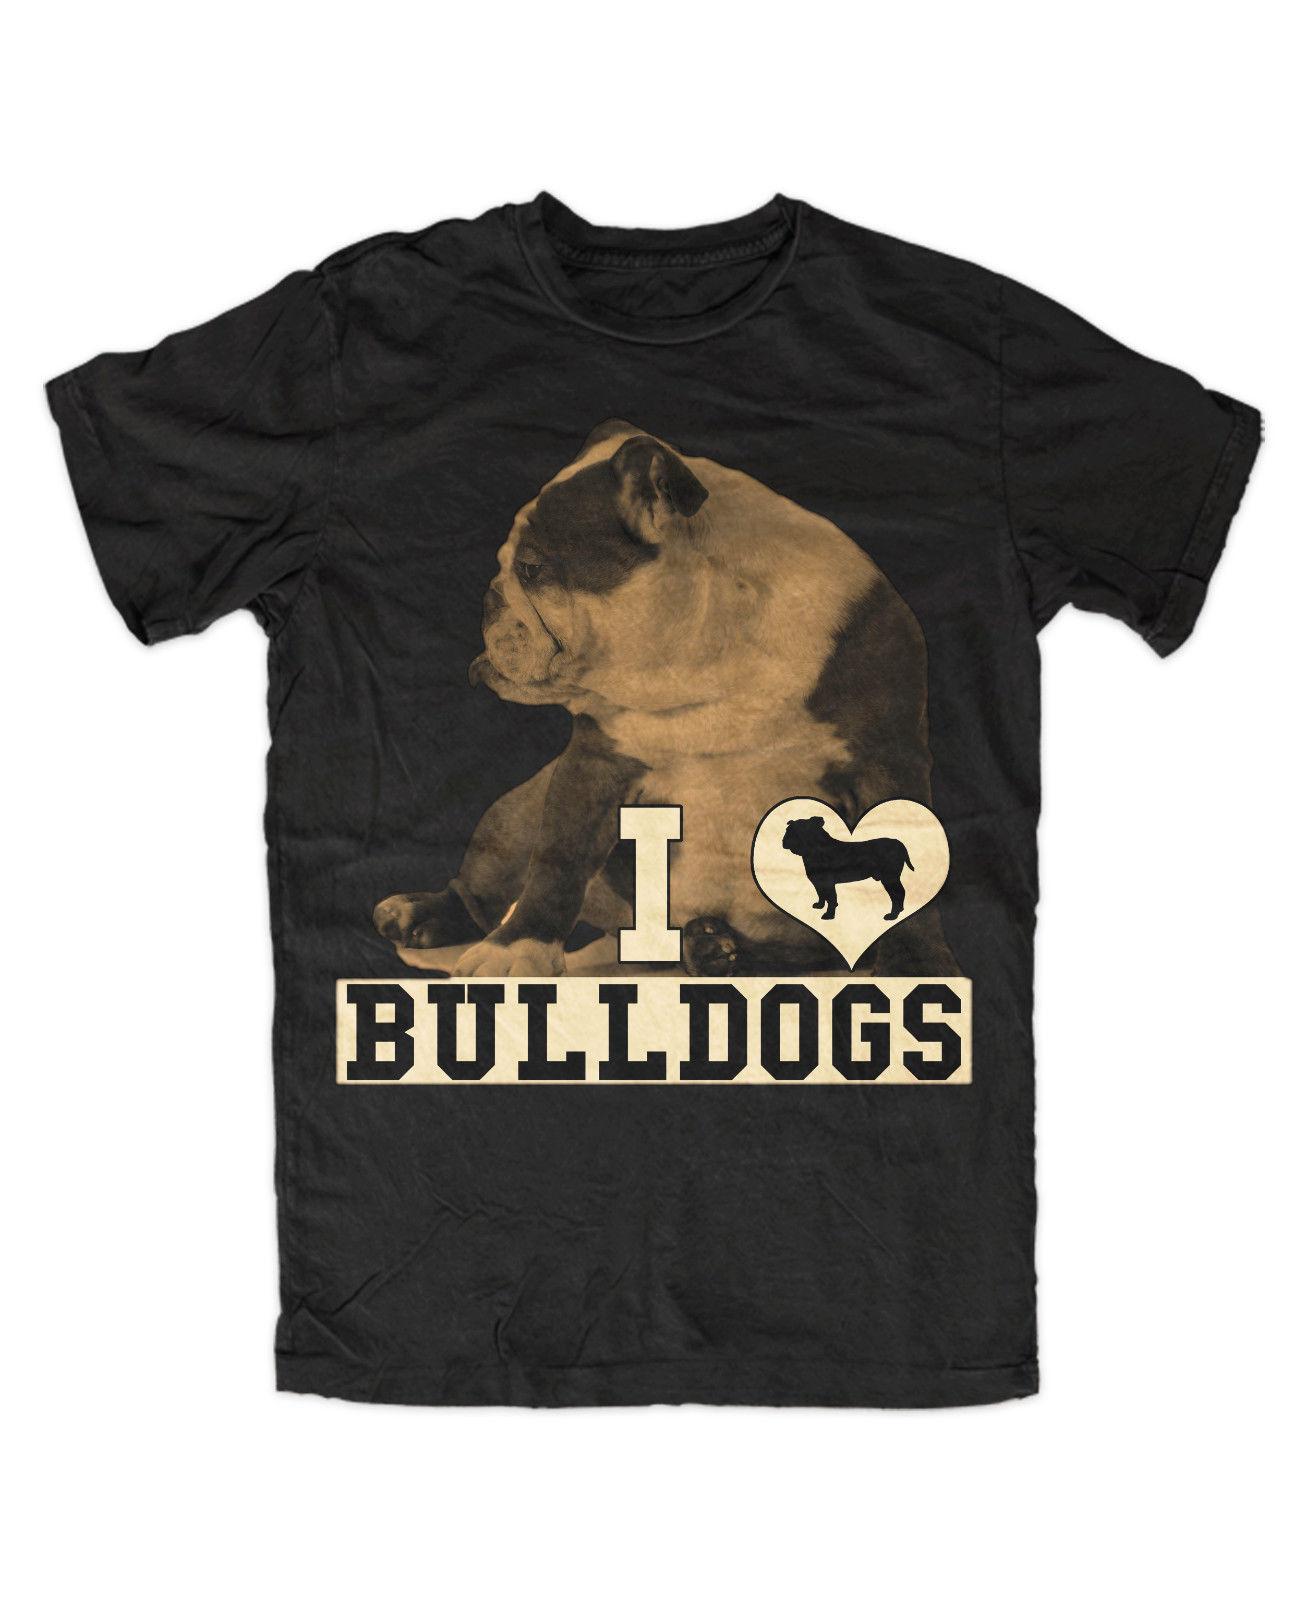 Englische Bulldogge футболка Шварц-Hund, собака, французский бульдог, Frenchi